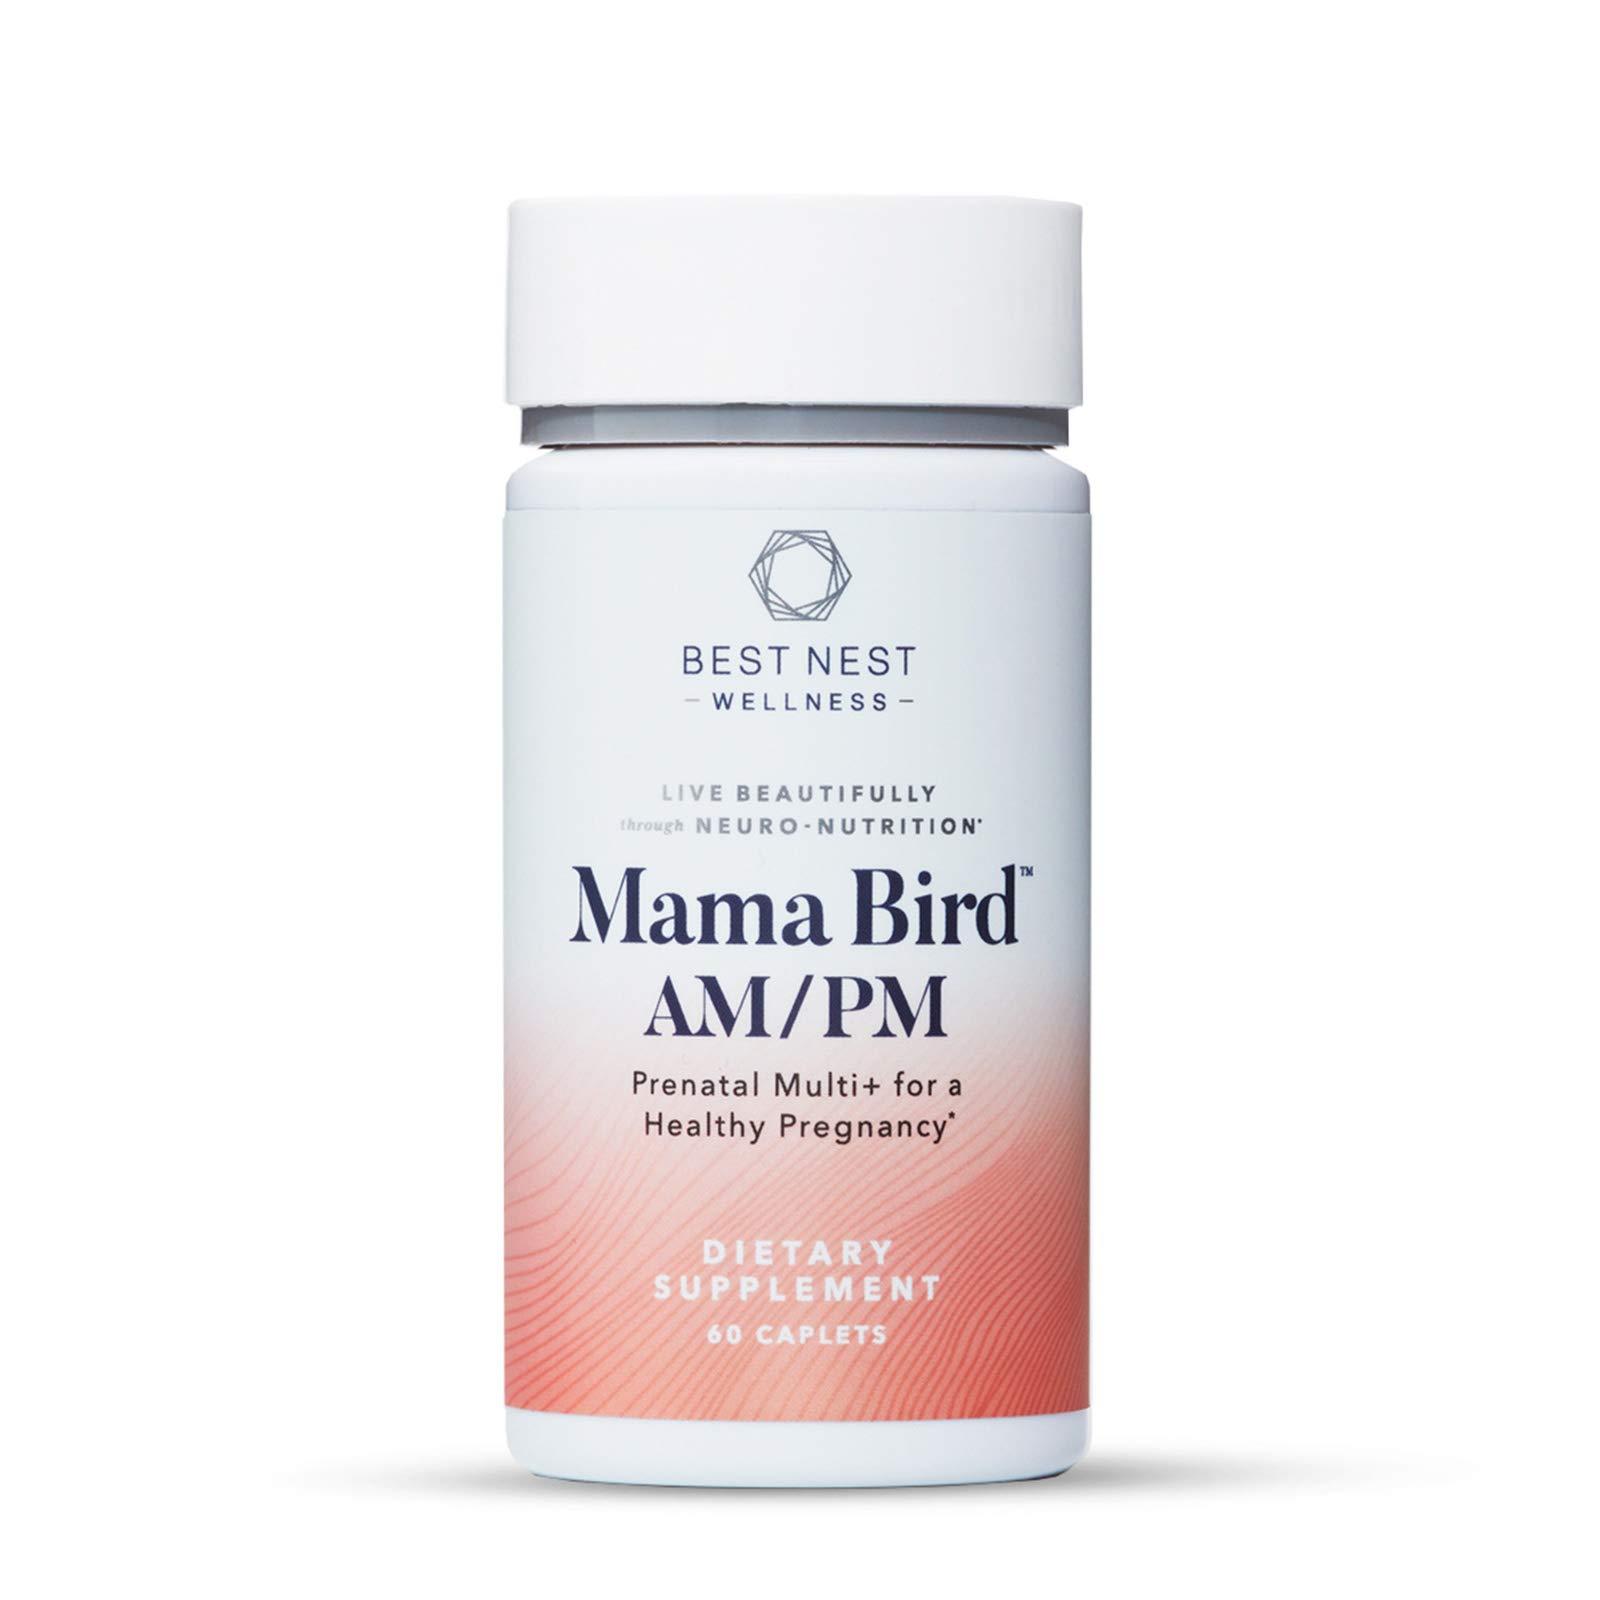 Mama Bird AM PM Prenatal Multi+, Methylfolate (Folic Acid), Methylcobalamin, Choline, Natural Whole Food Organic Herbal Blend, Vegan, Twice Daily Vitamin, Immune Support, 60 Ct, Best Nest Wellness